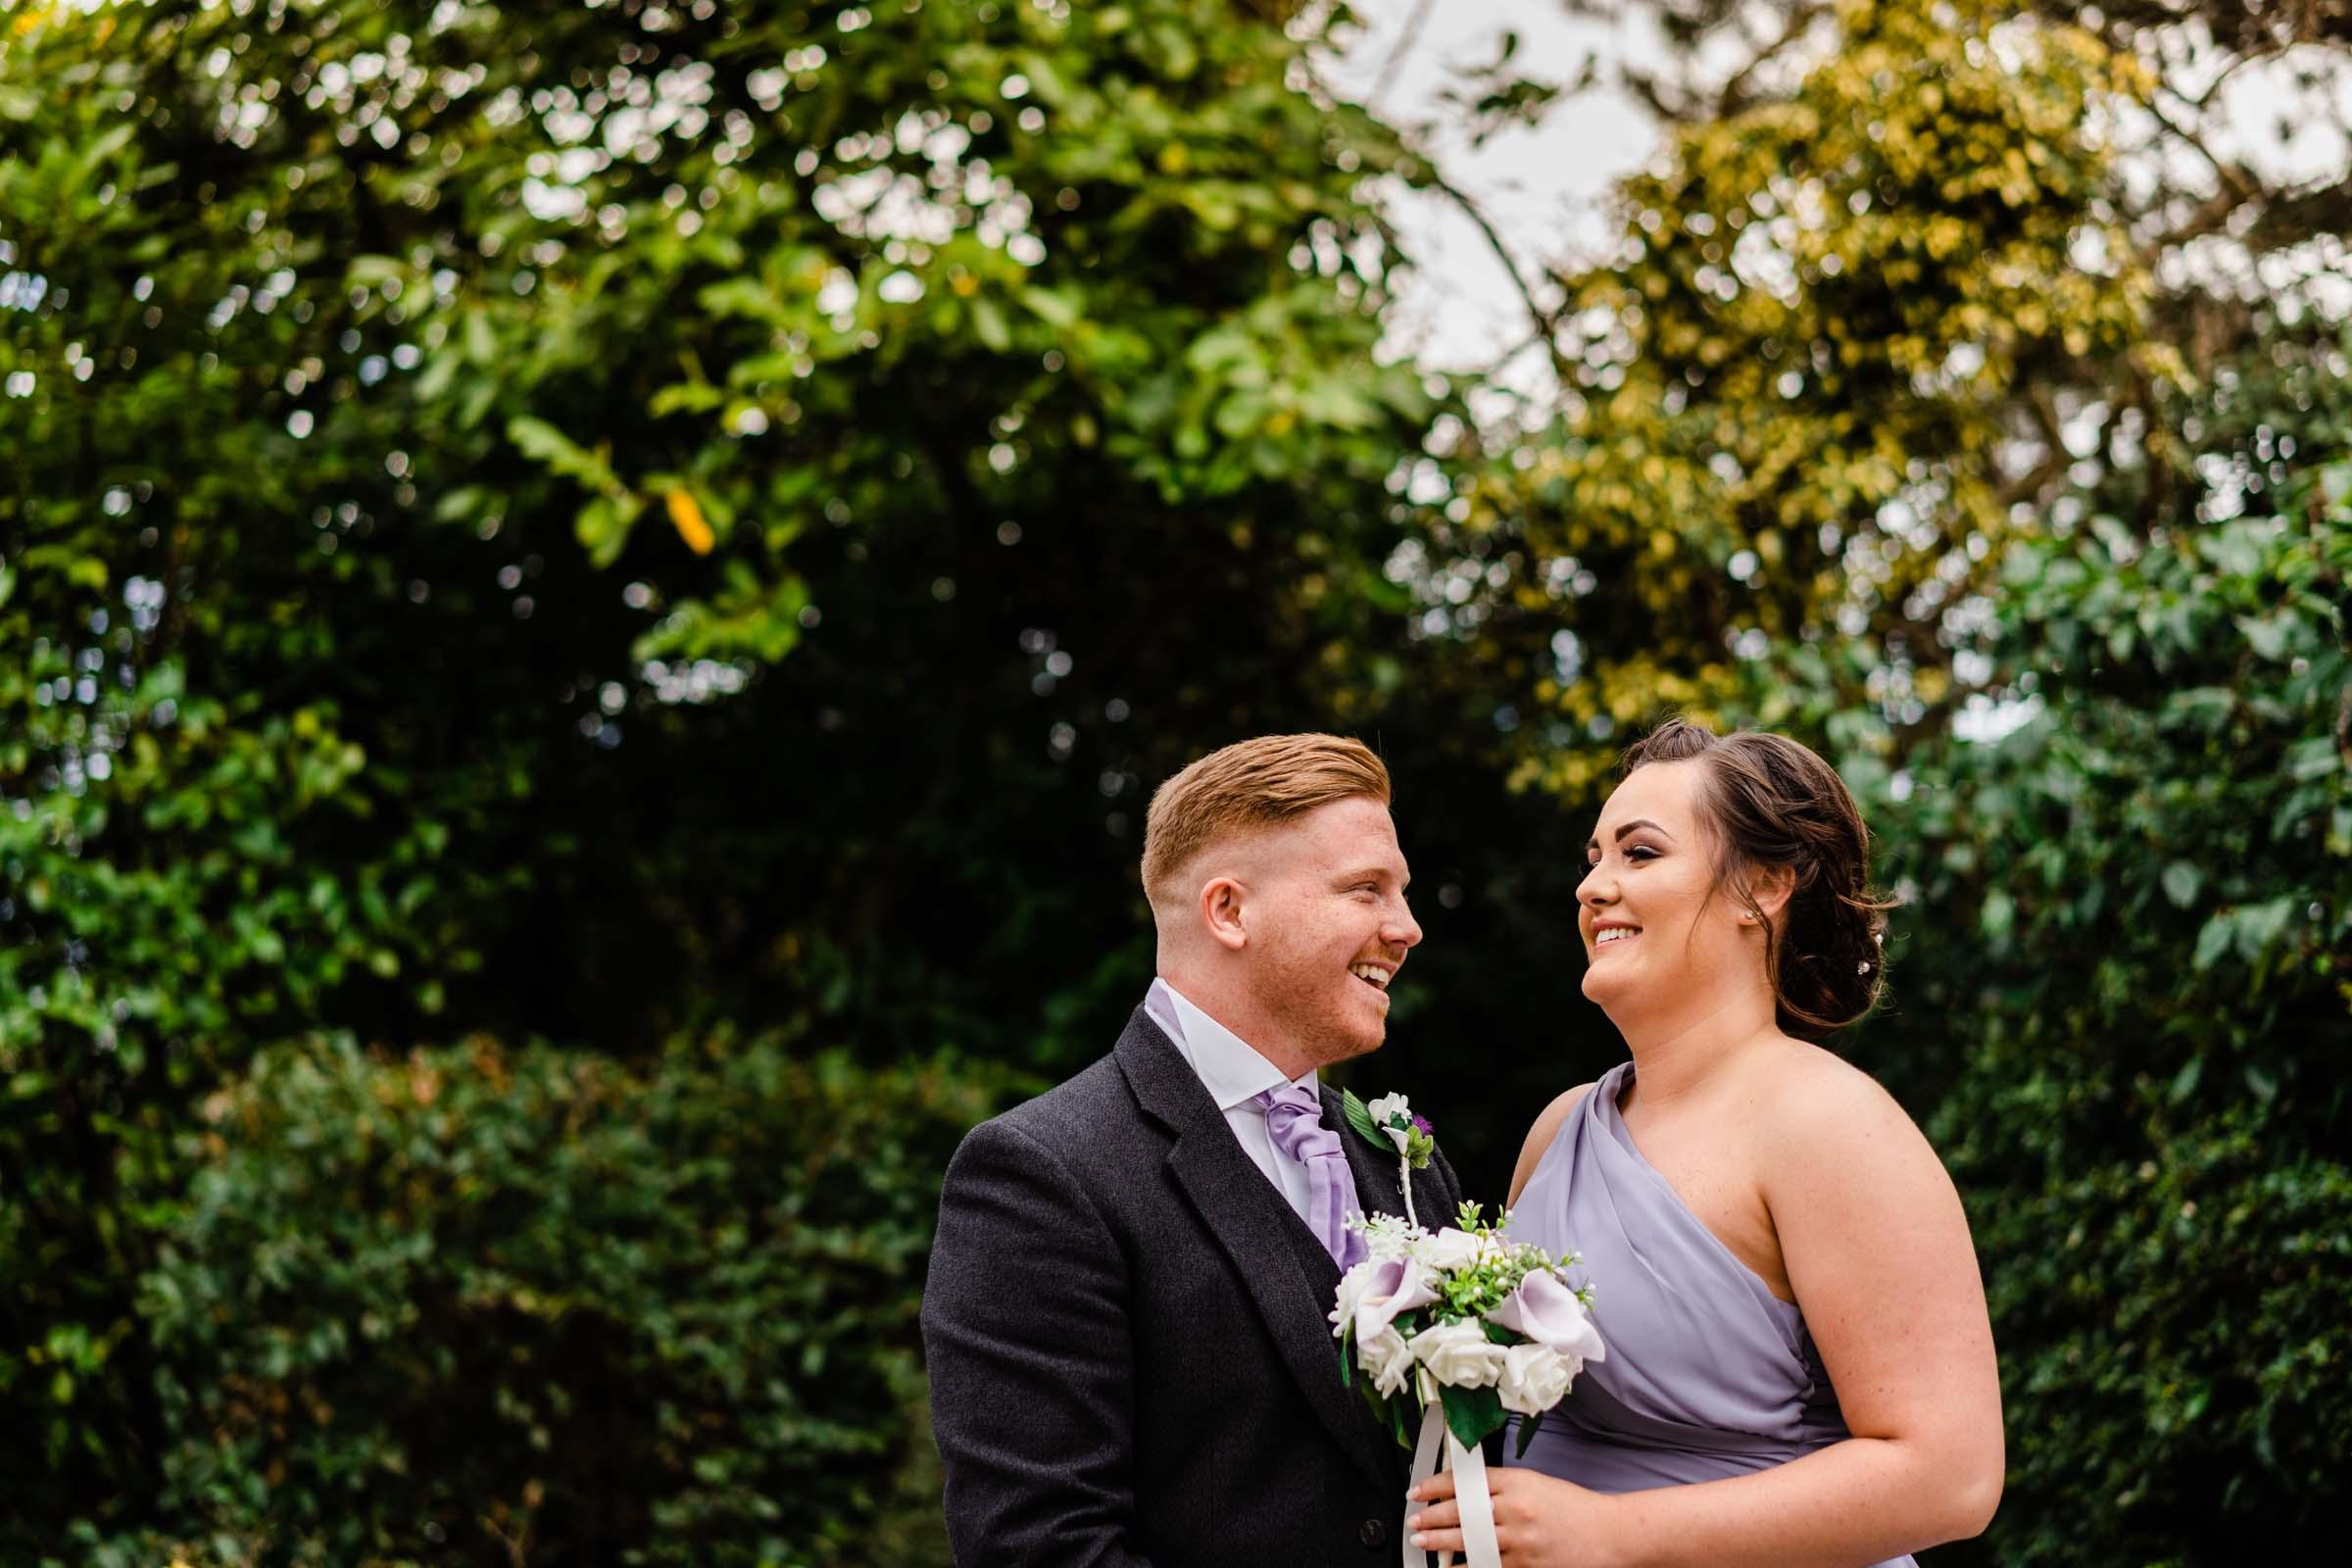 motherwell-moorings-wedding-photographer-dearlyphotography (53 of 77).jpg